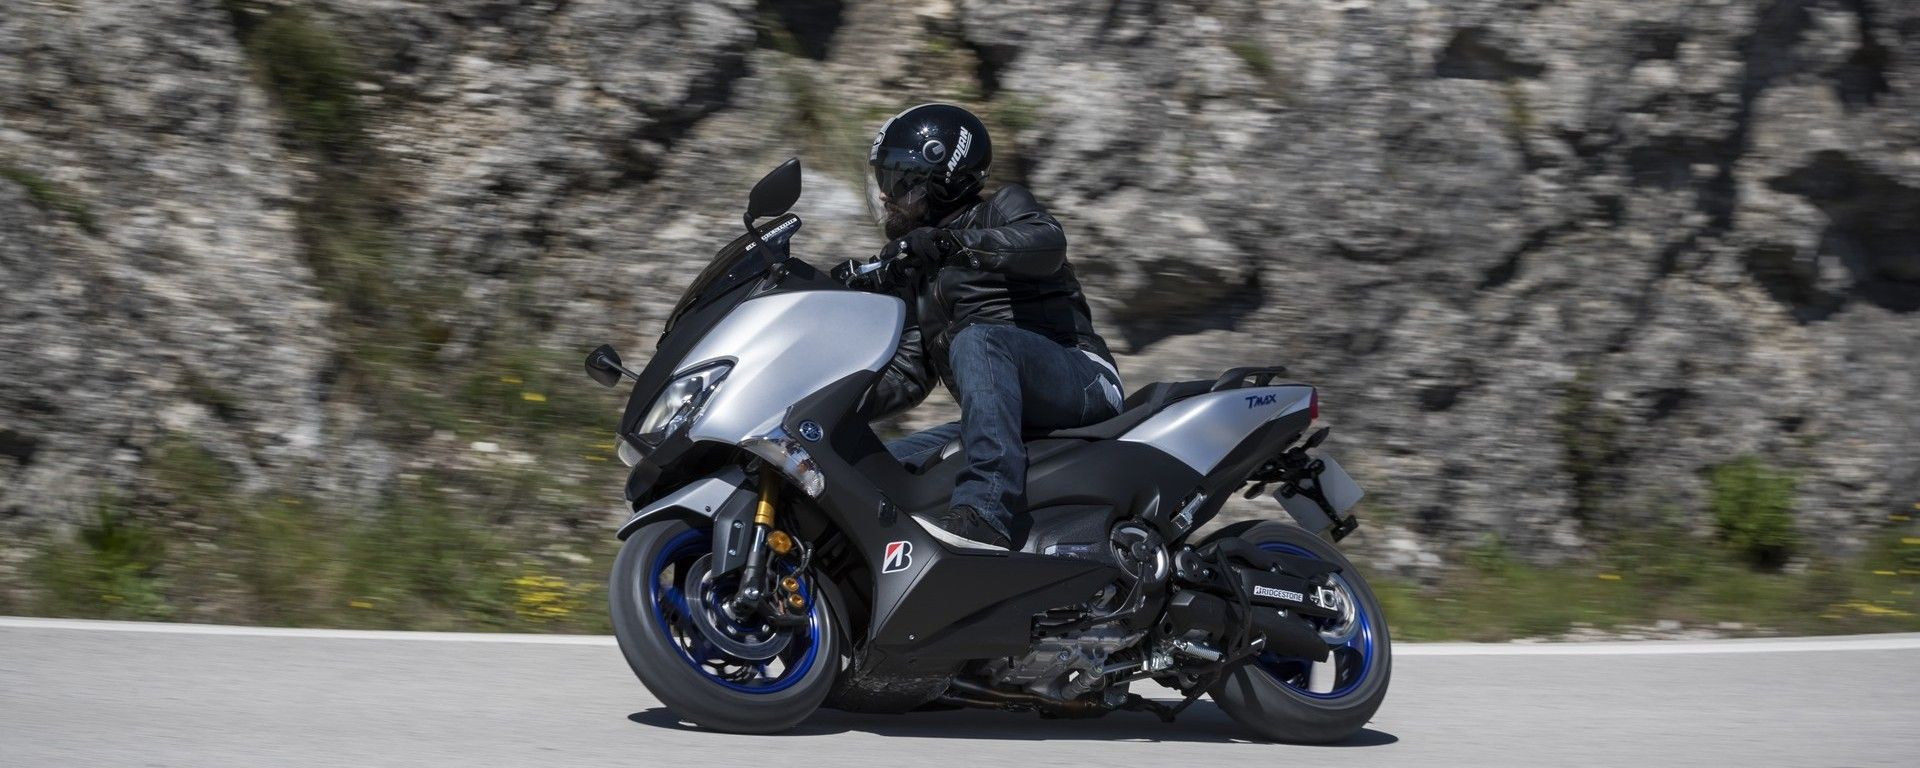 Bridgestone Battlax SC2 e SC2 Rain: ideali per i maxi scooter